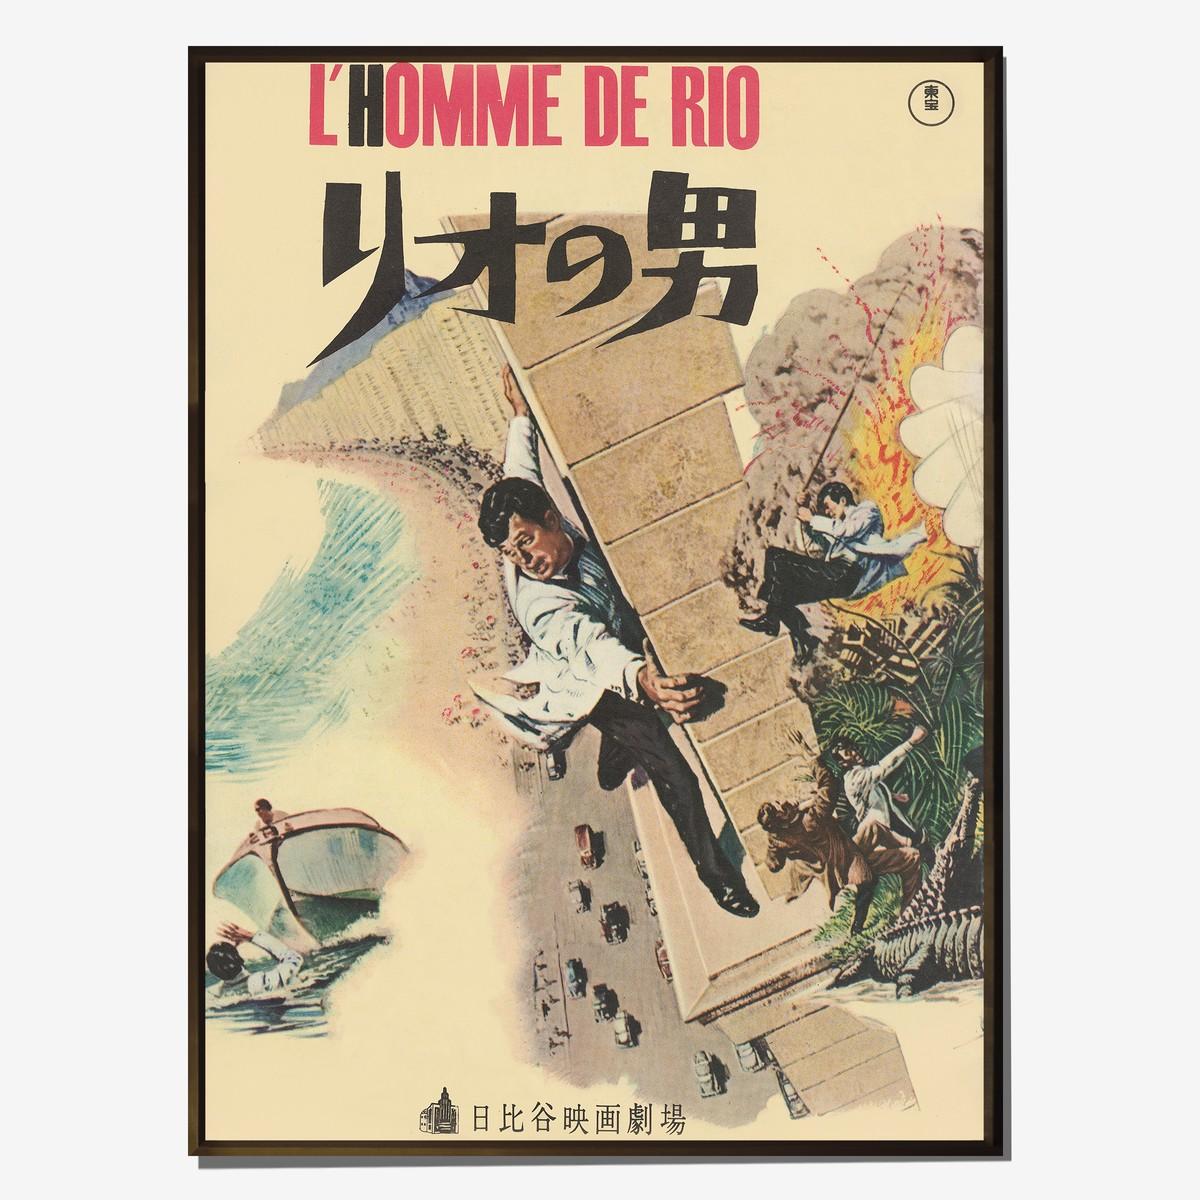 Photo of L'Homme de Rio Vintage Advertising Poster